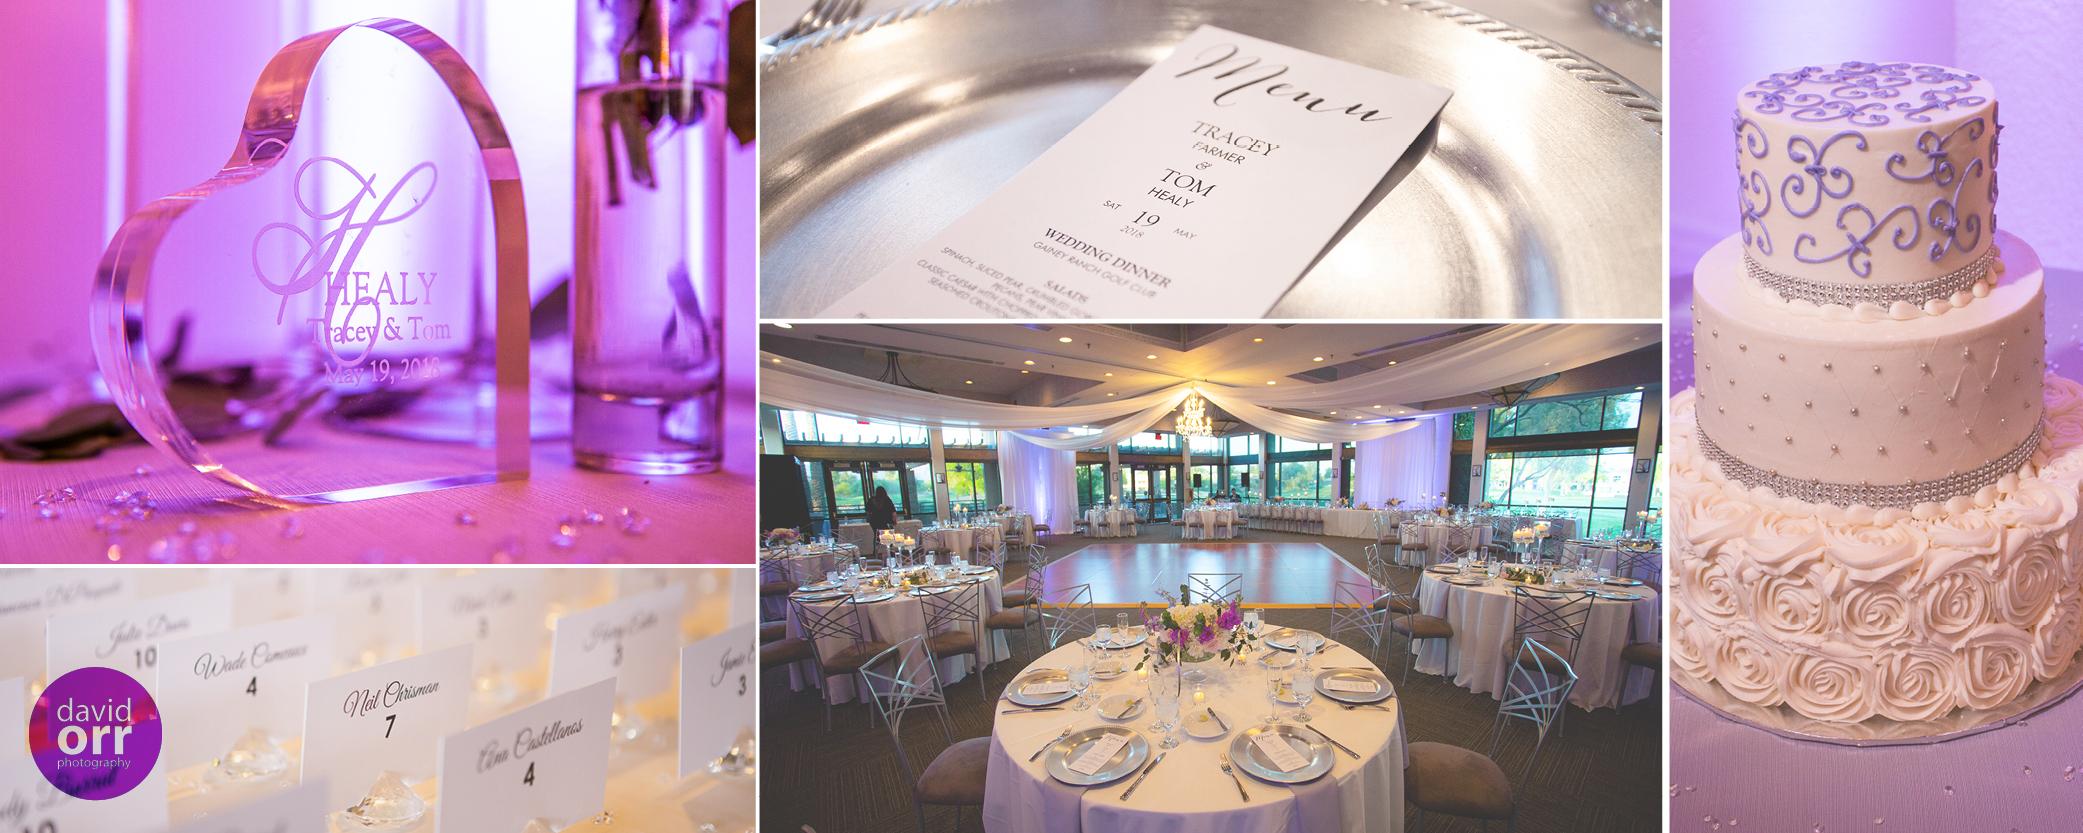 DavidOrrPhotography_Gainey-Ranch-Wedding-Reception.jpg